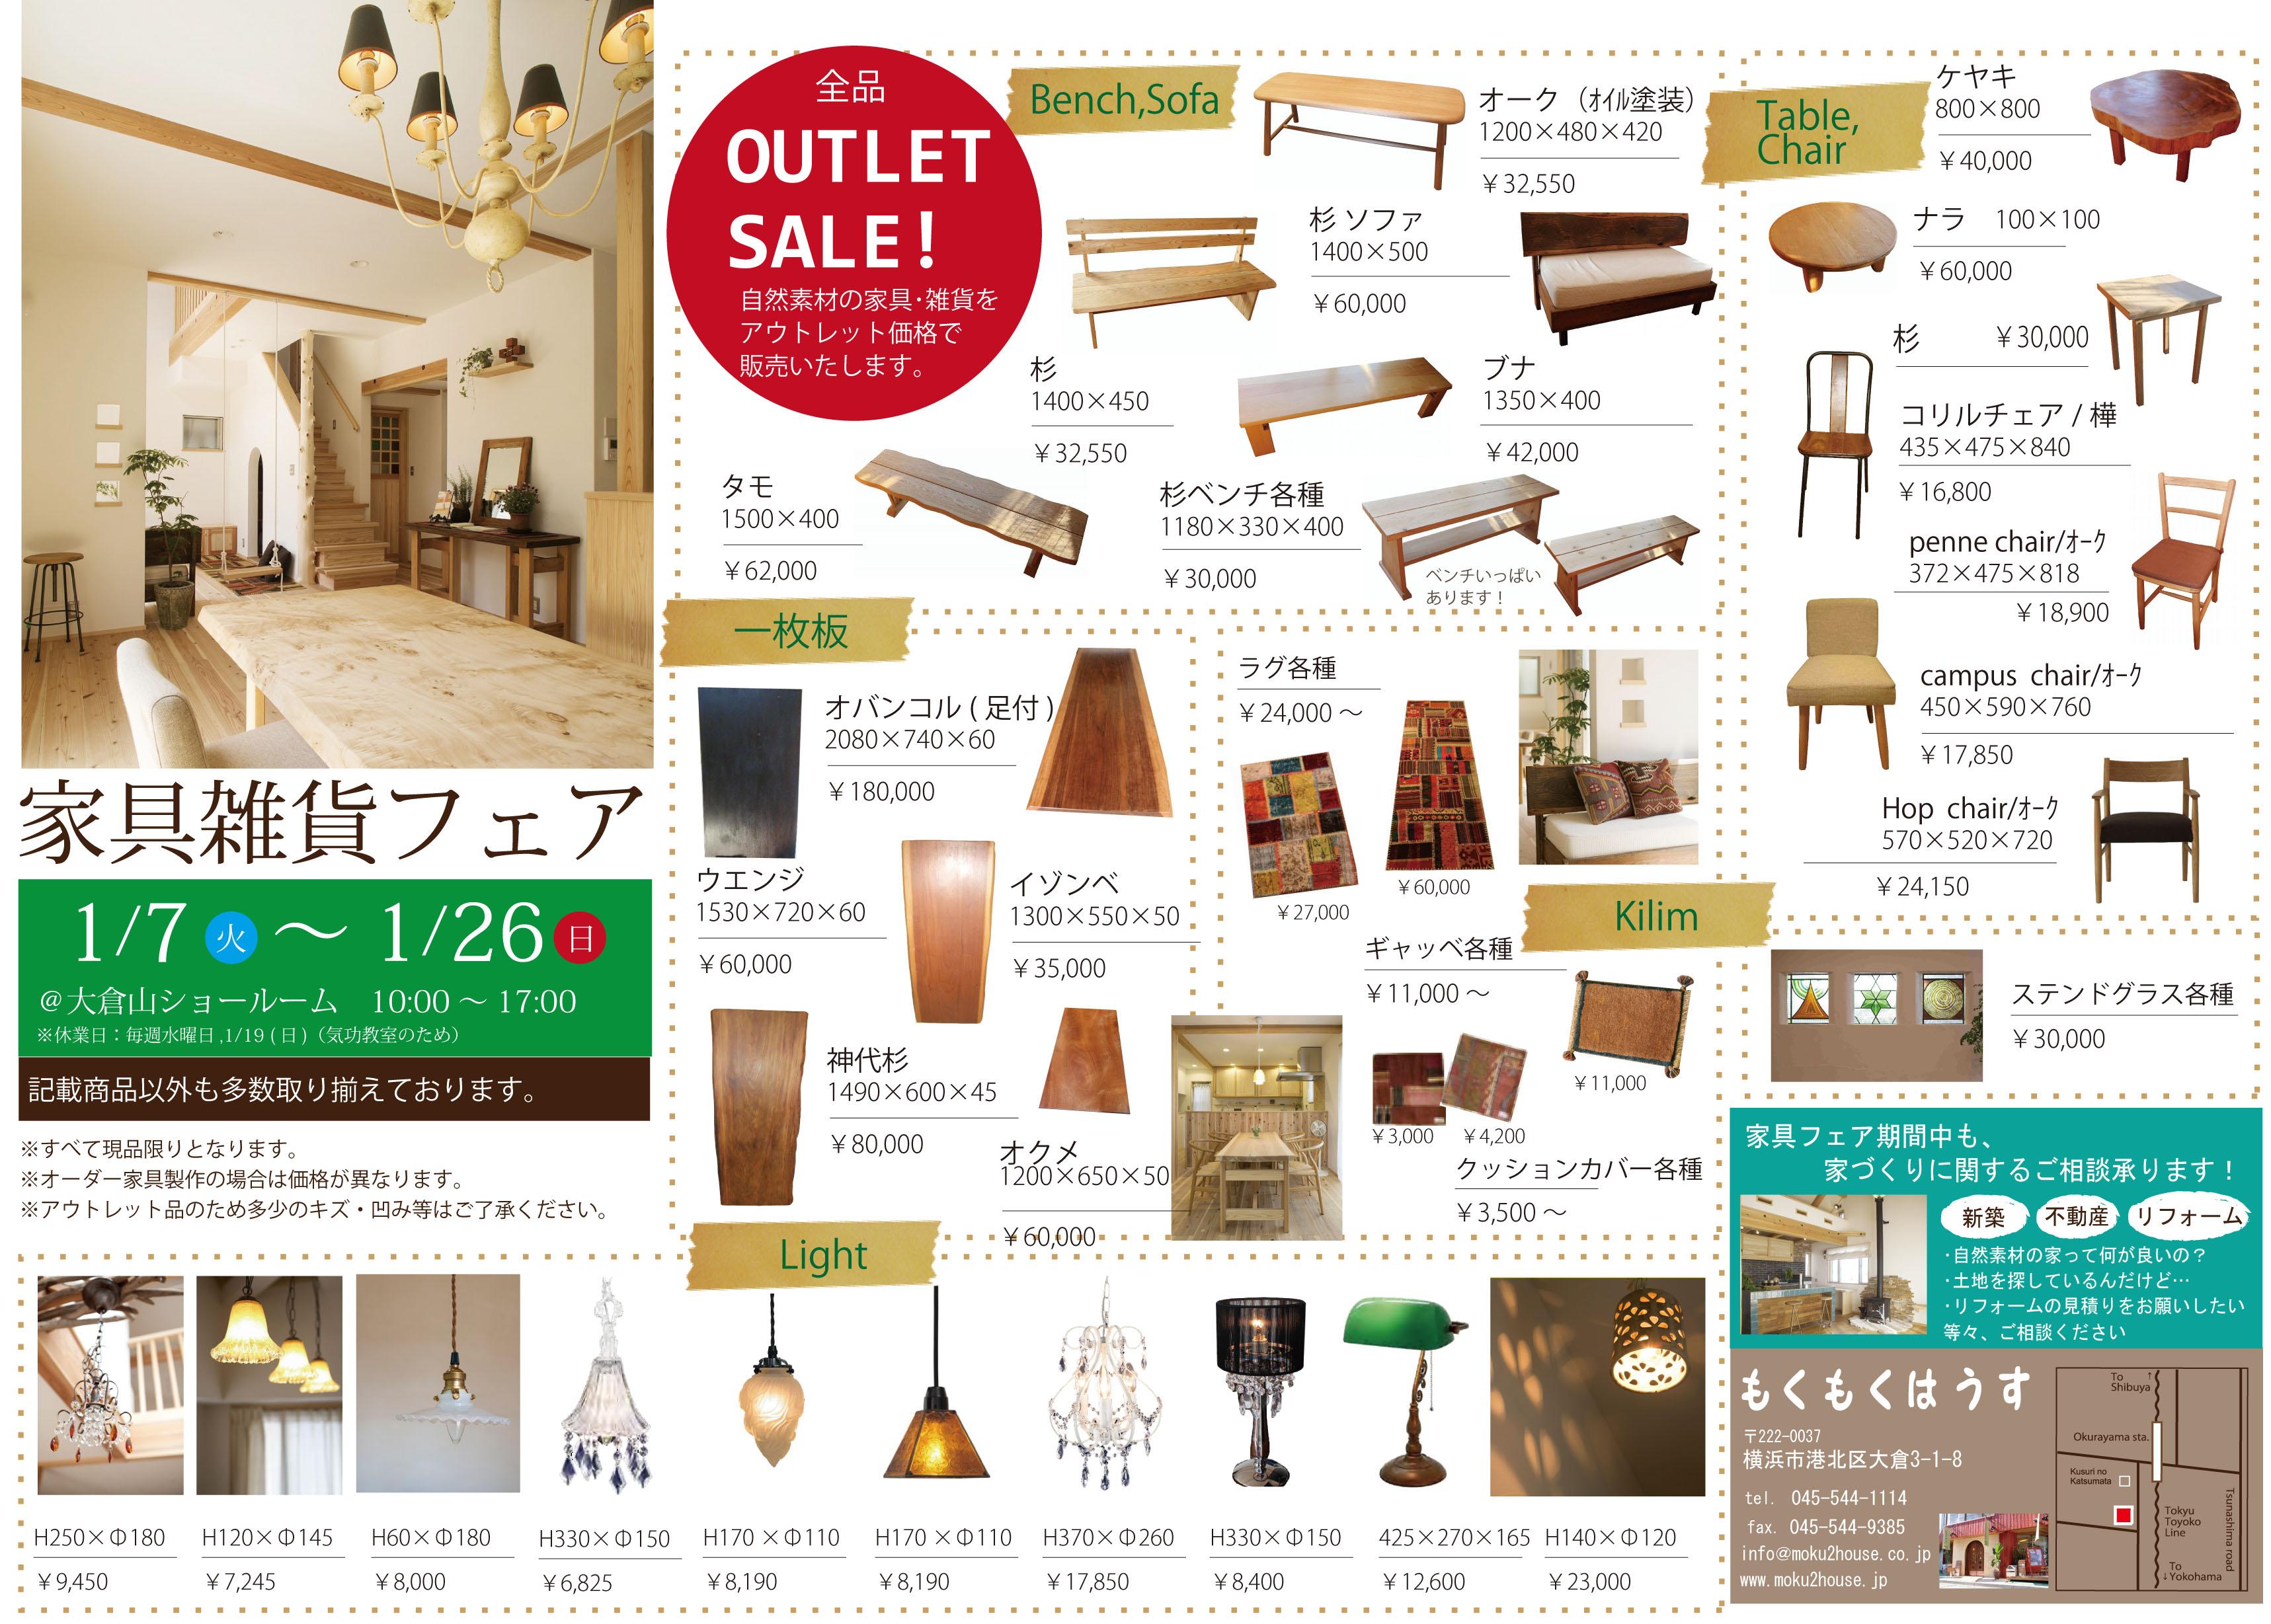 H26.1.7(火)~1.26(日)家具・雑貨フェア